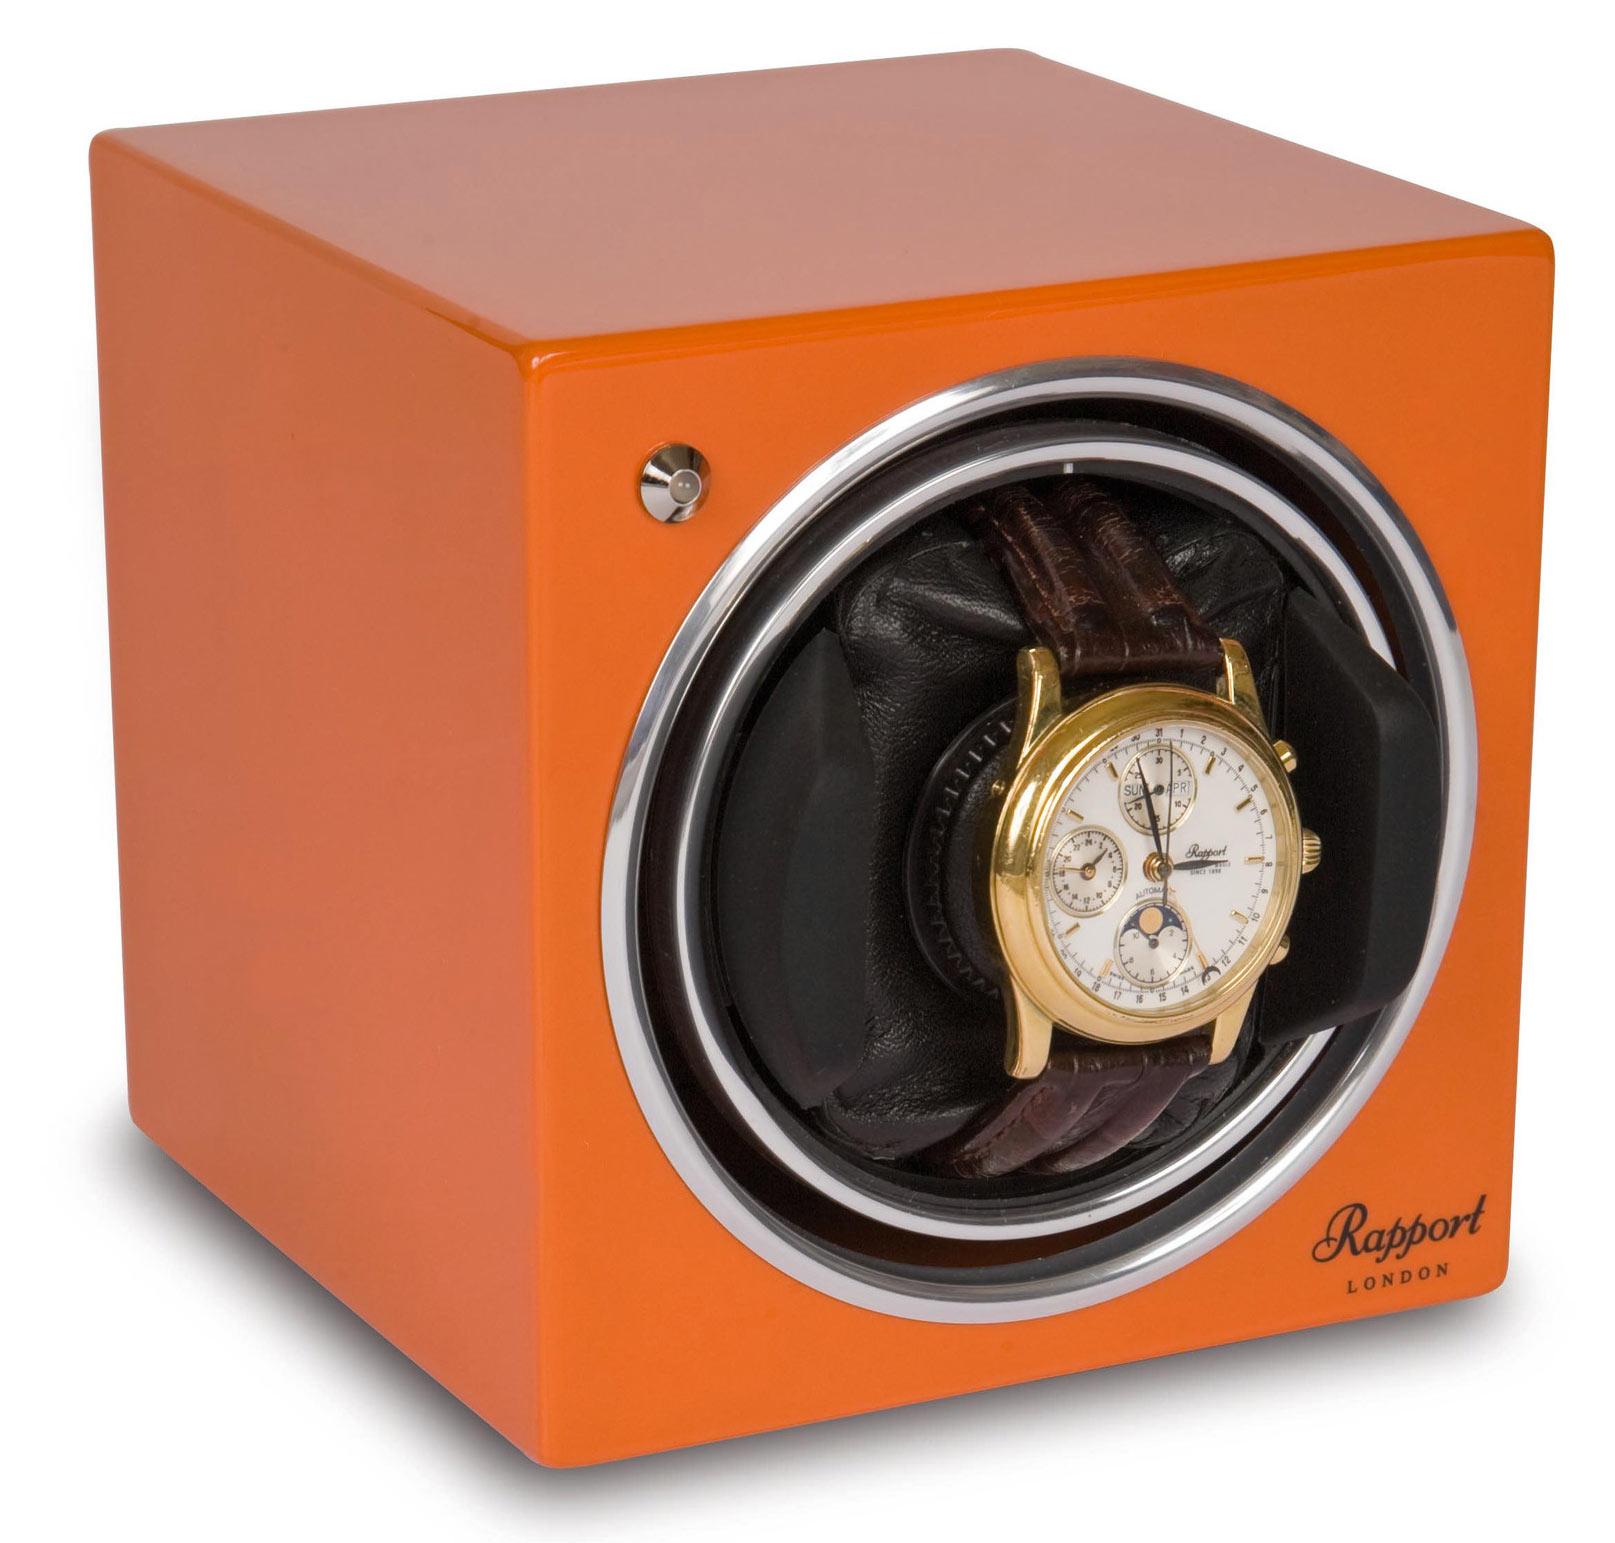 EVO10 Модуль для подзавода одних наручных часов, оранжевого цвета